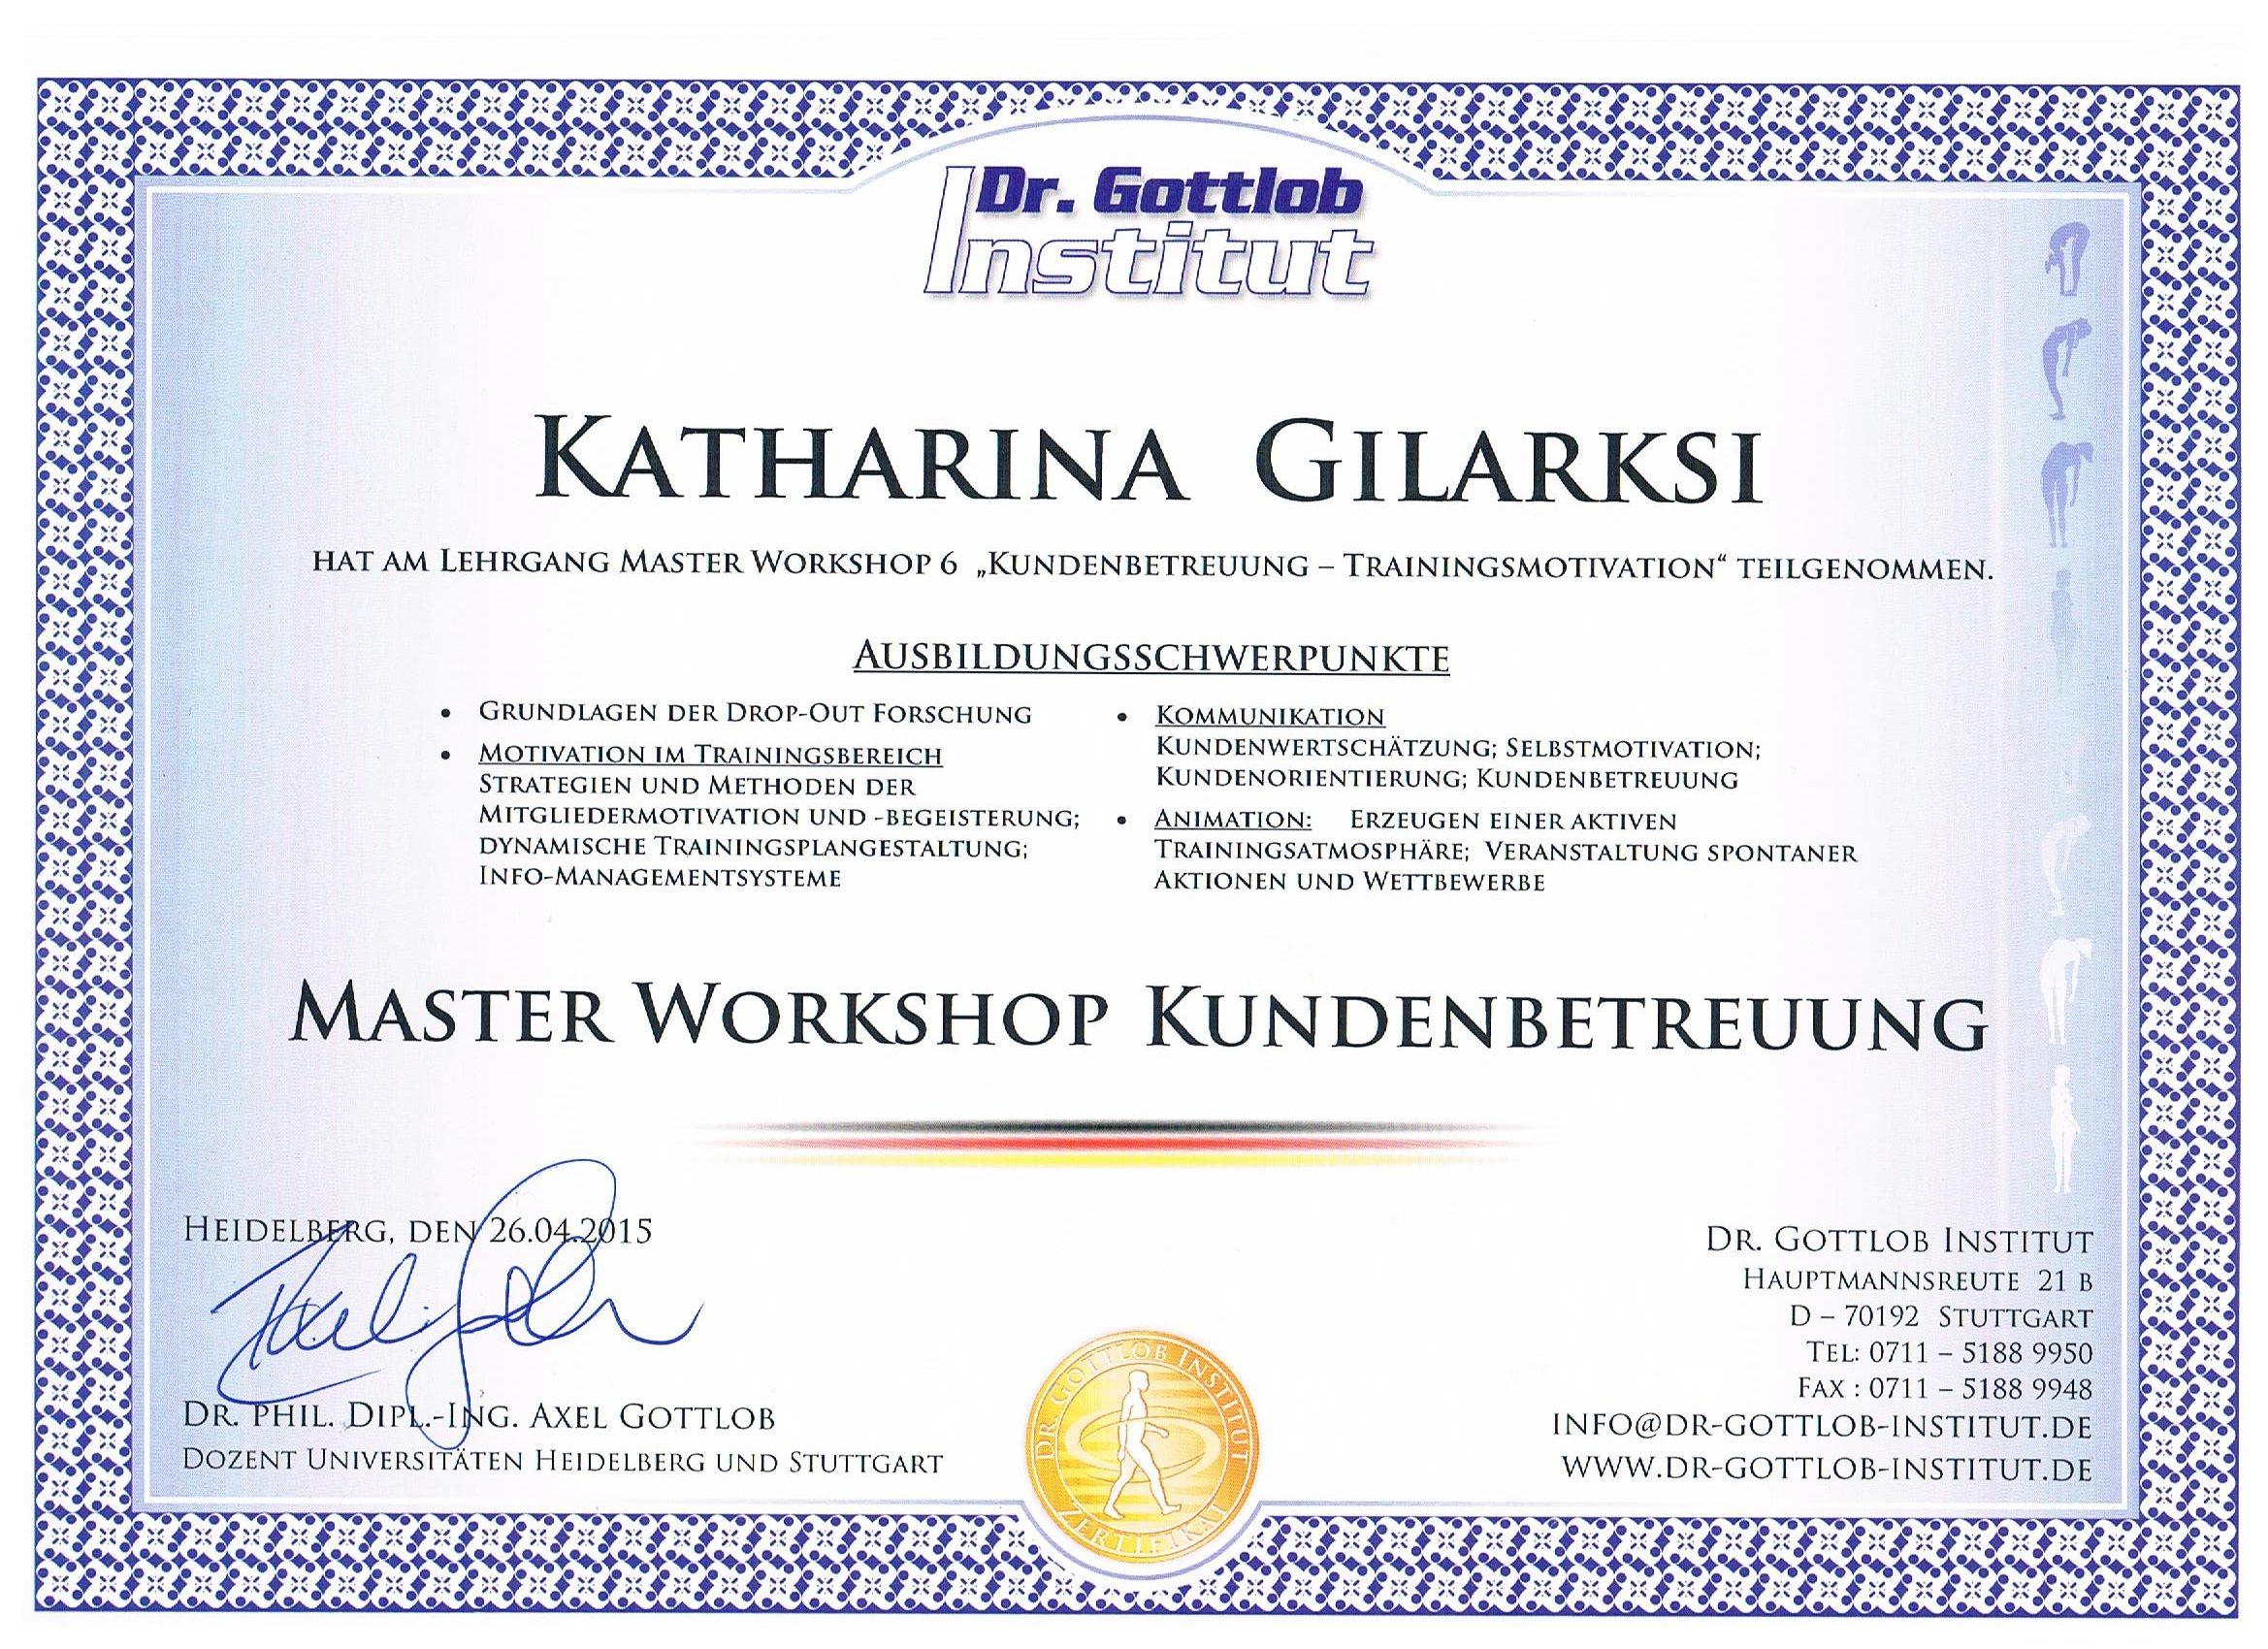 Zertifikat Trainer A-Lizenz Dr. Gottlob Institut